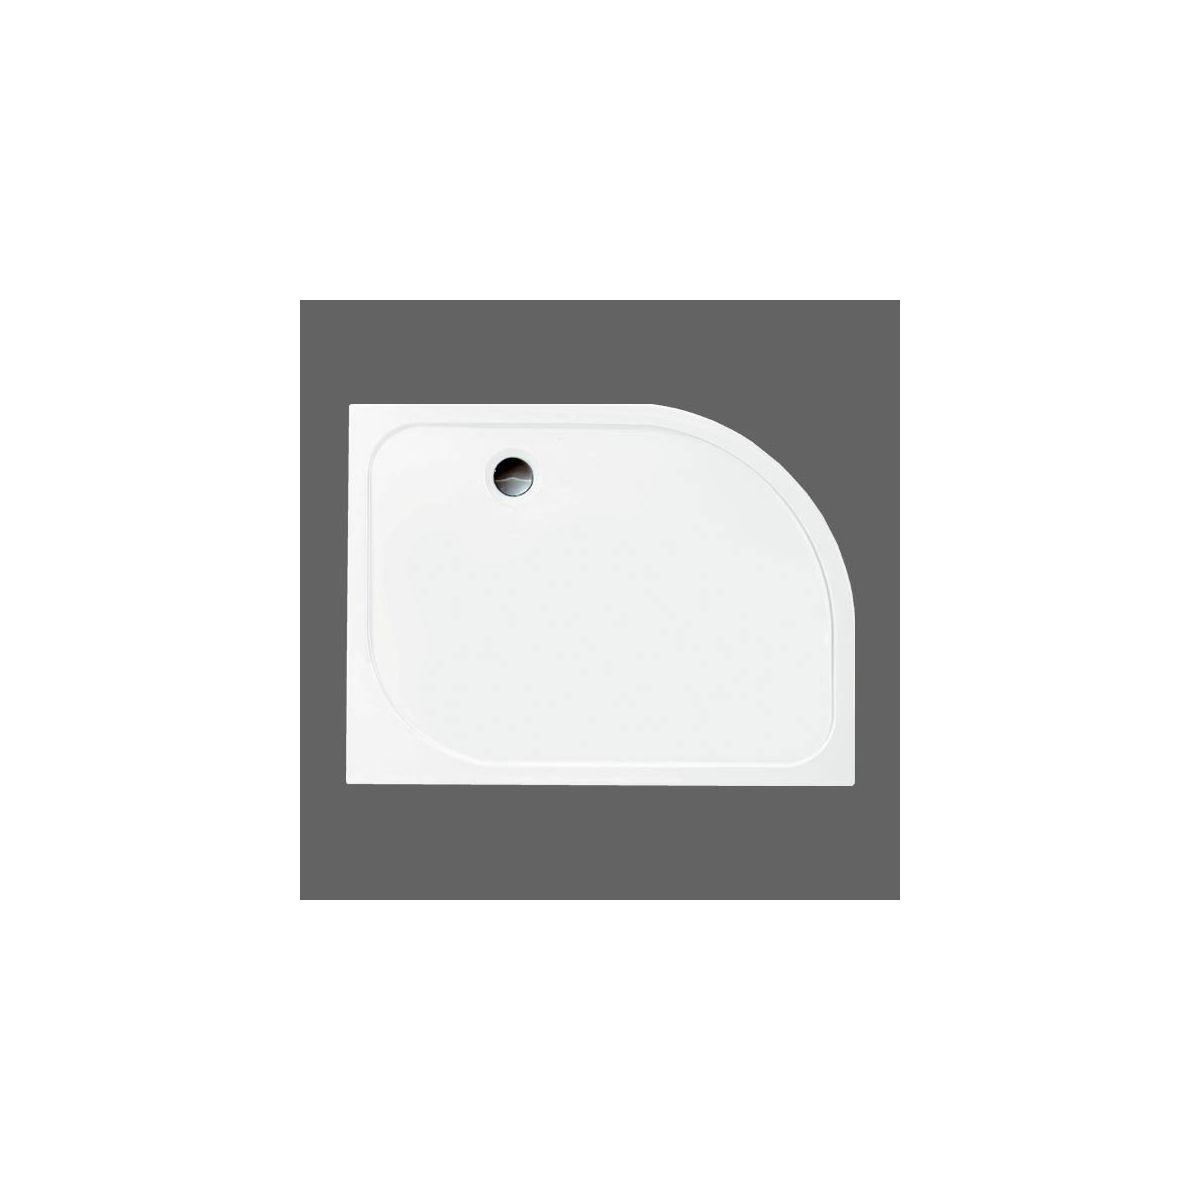 Merlyn MStone Offset Quadrant Shower Tray Left  Hand 1200 x 900mm